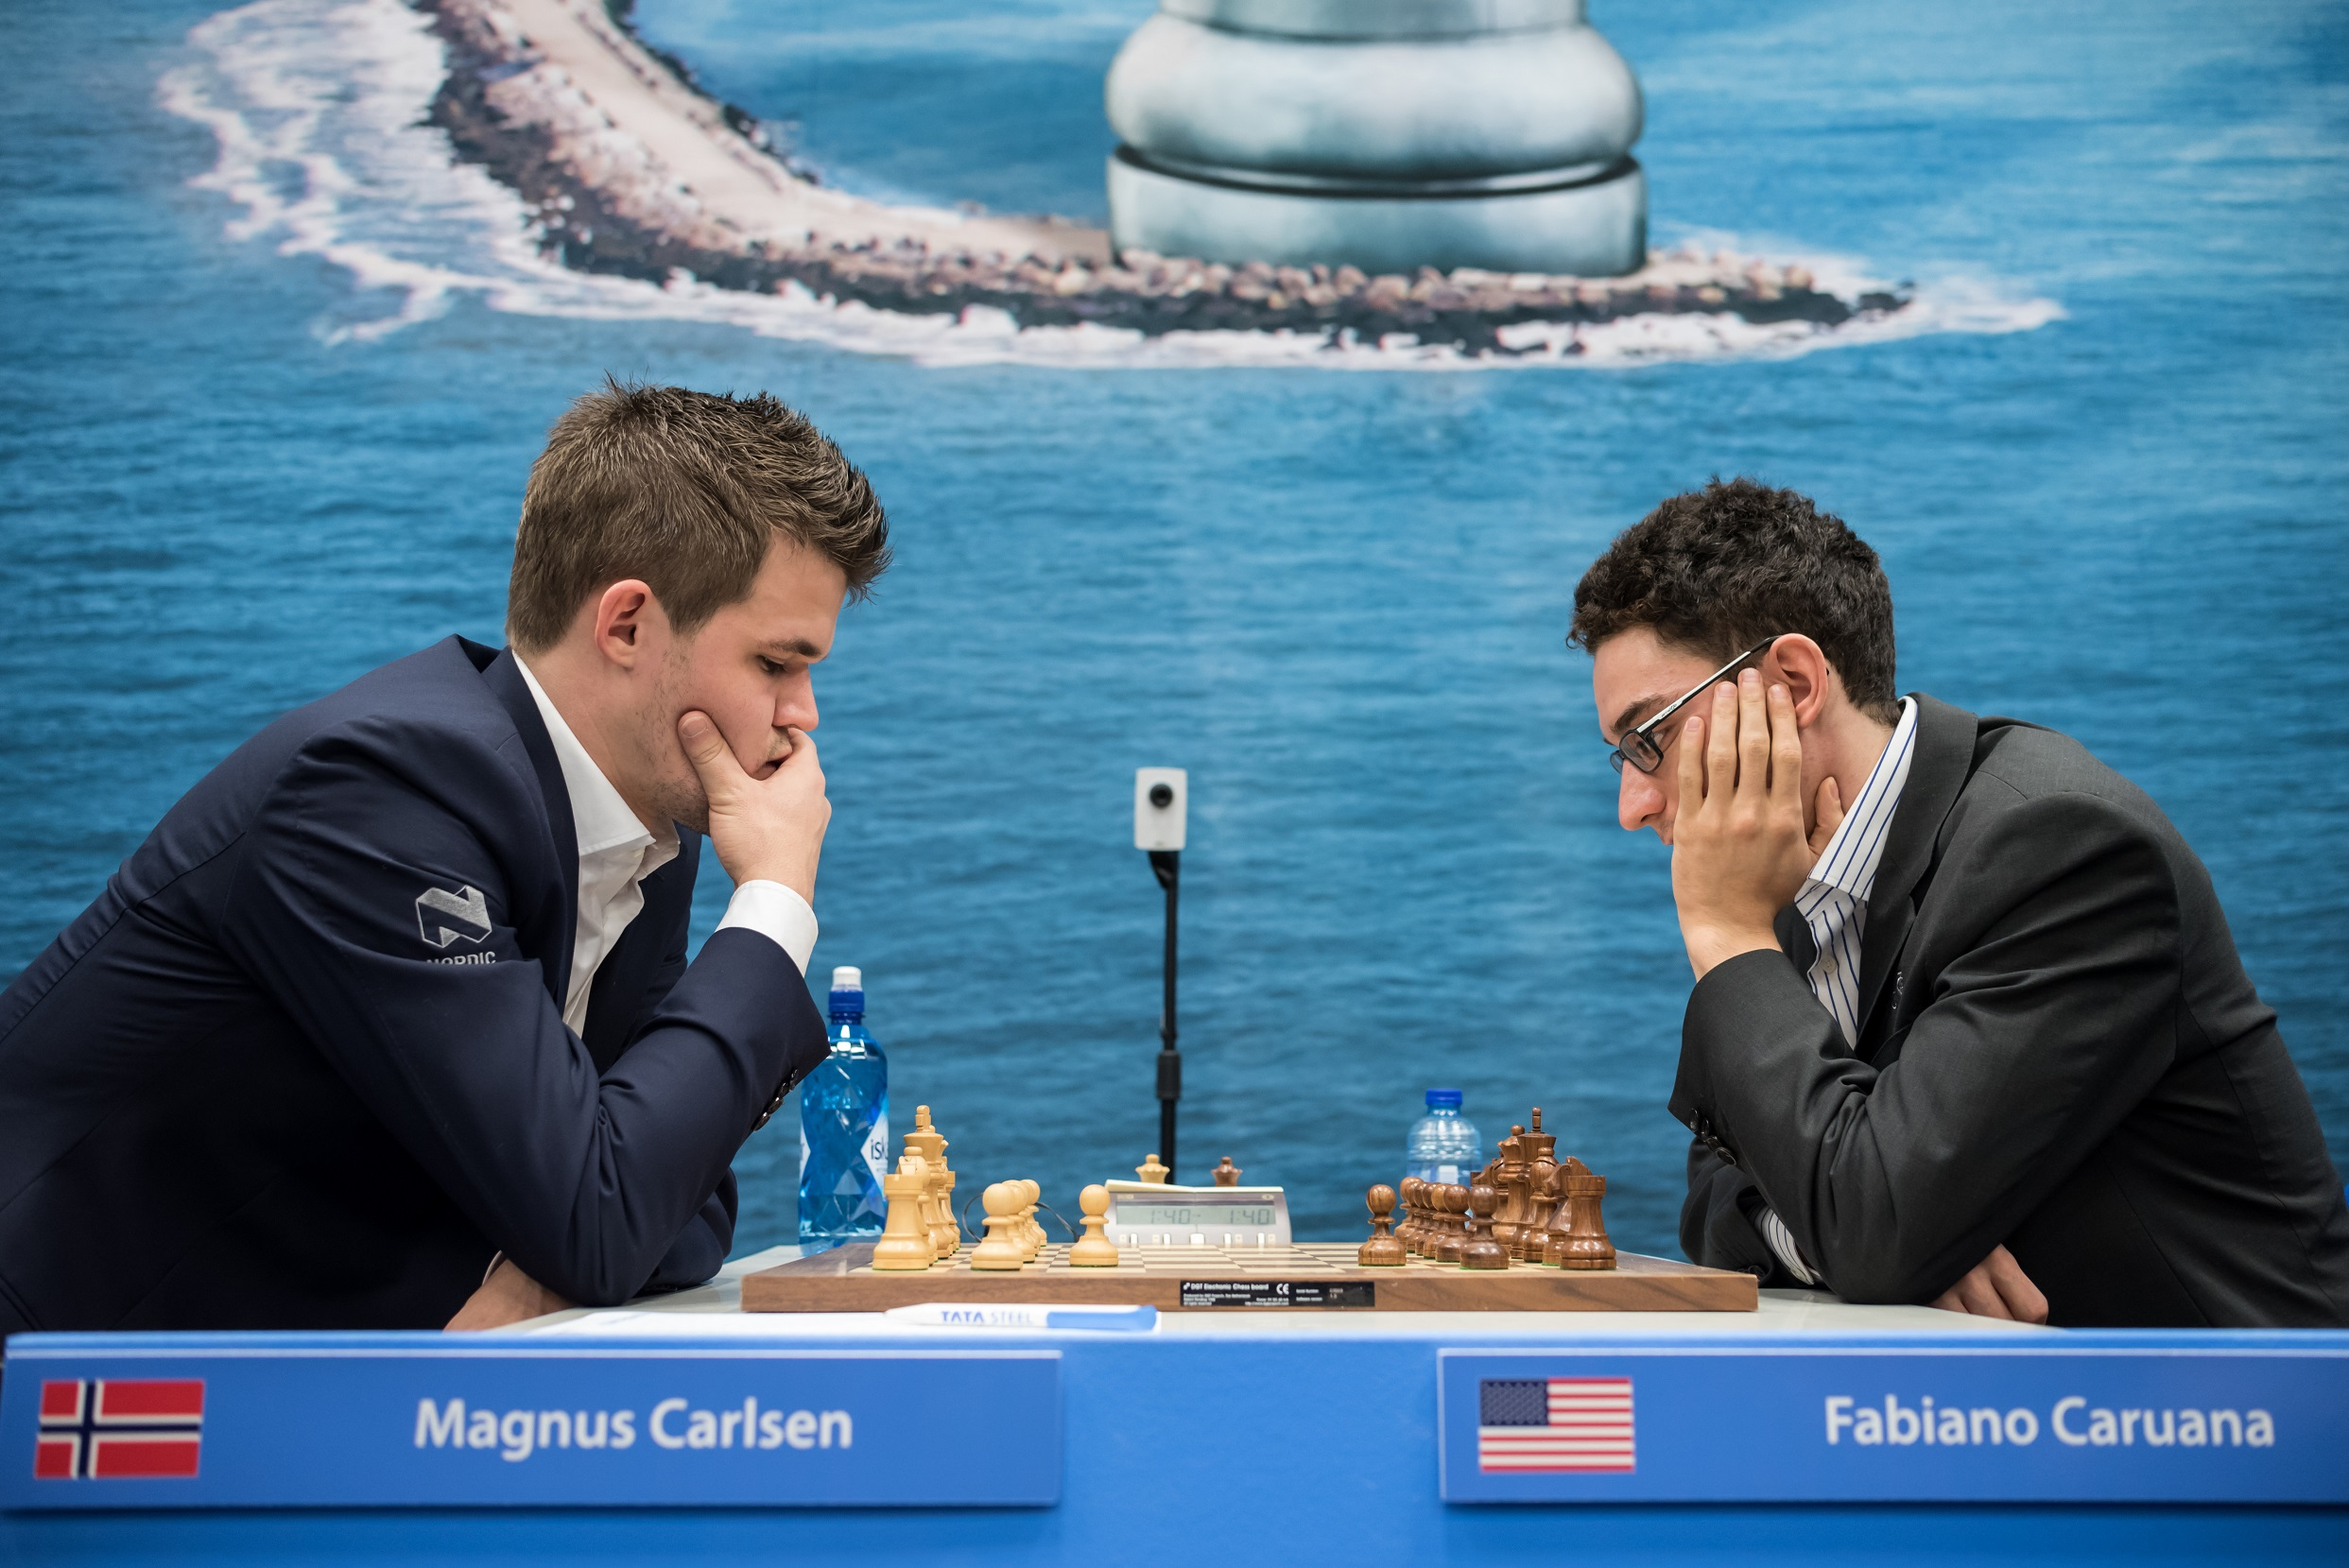 Vachier-Lagrave & Nakamura tie game 1 of Final | Chessdom